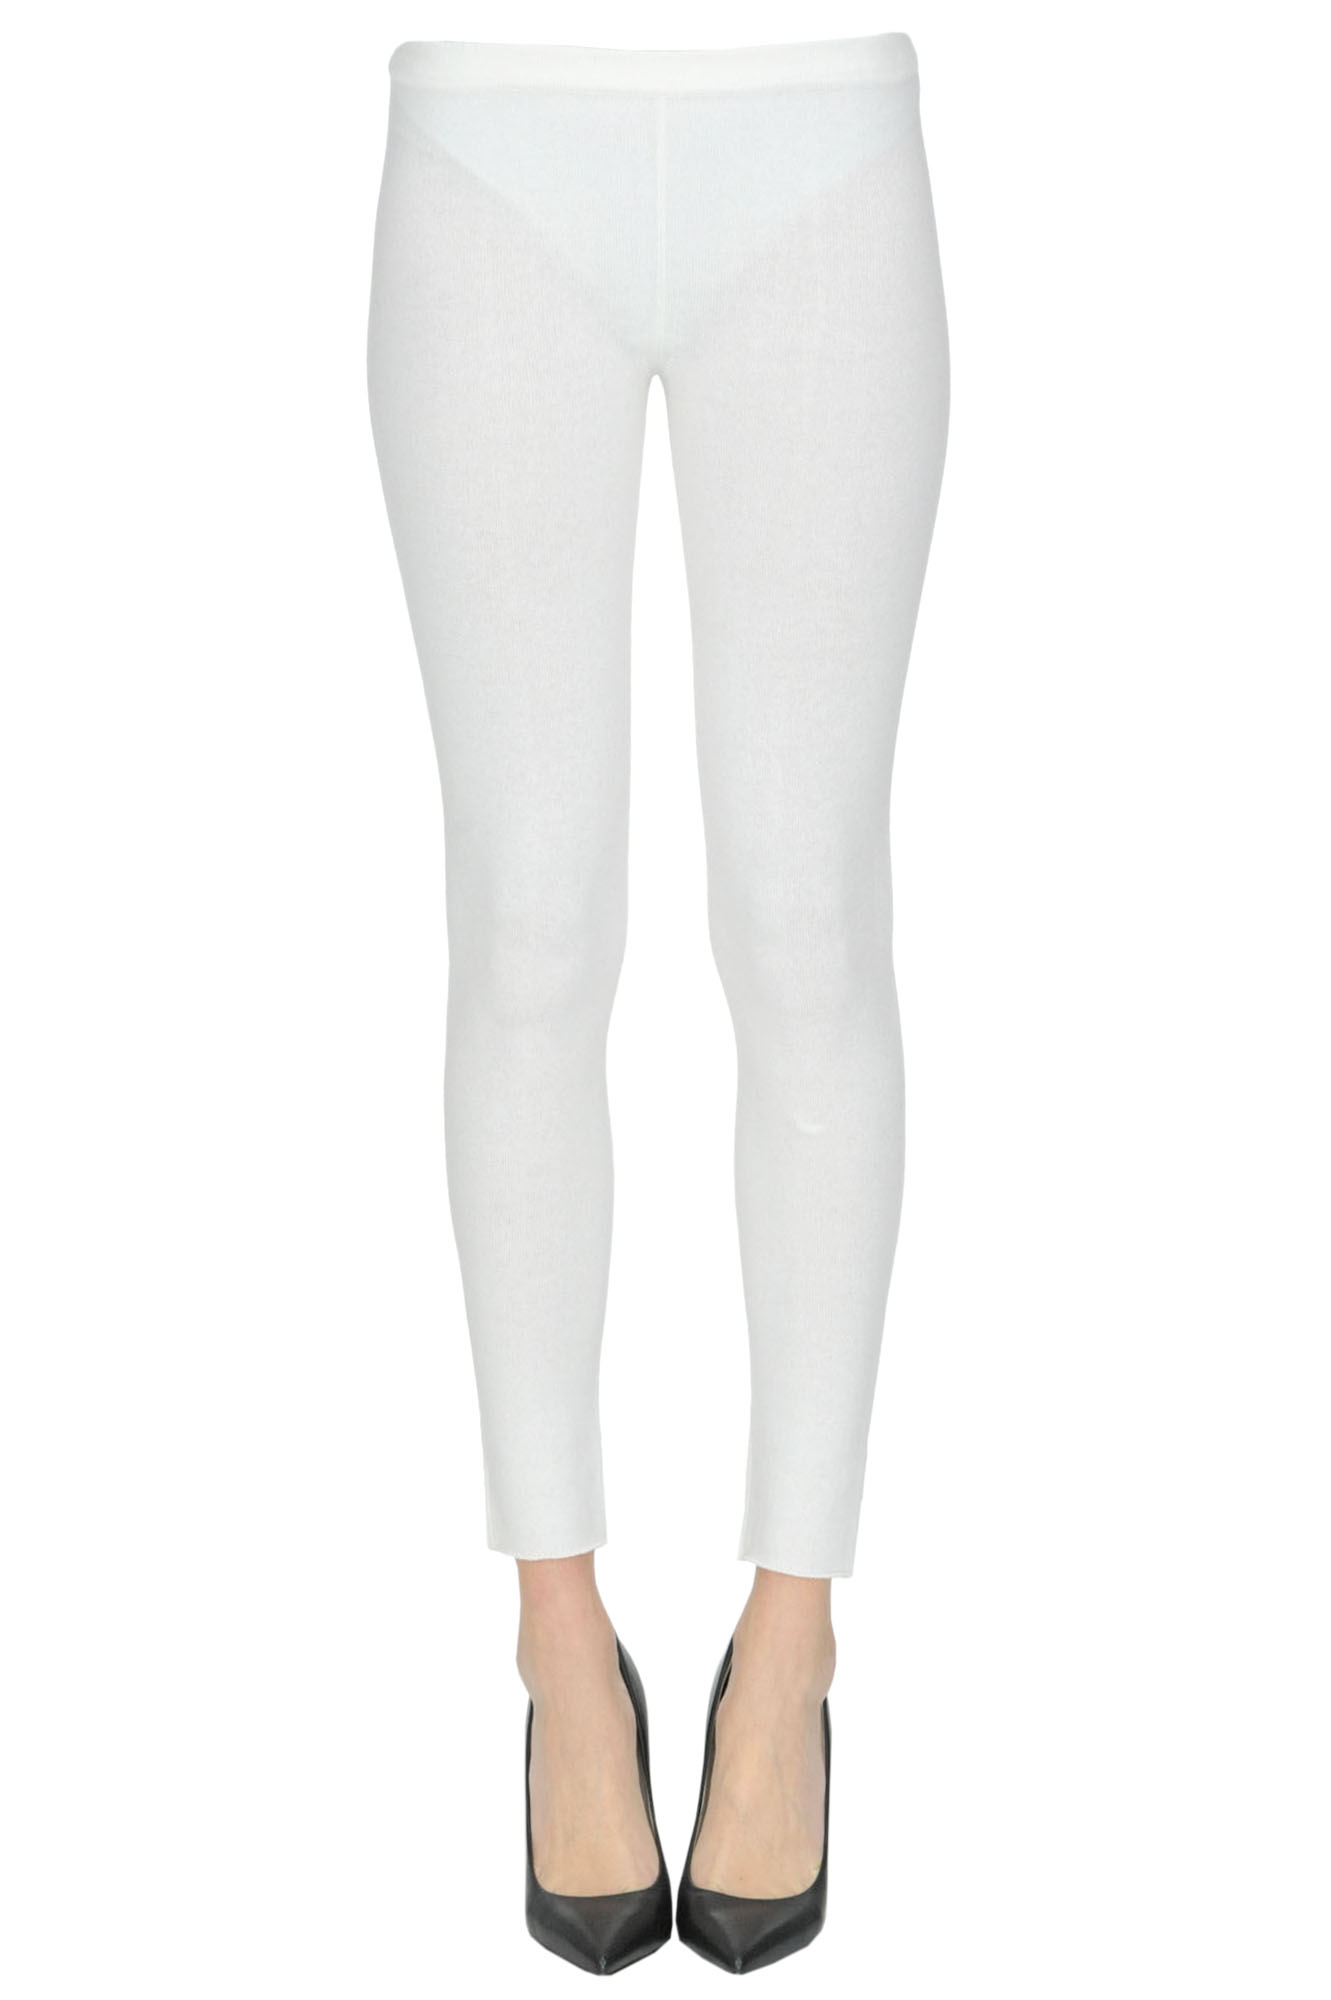 ALYKI Cashmere Leggings in White